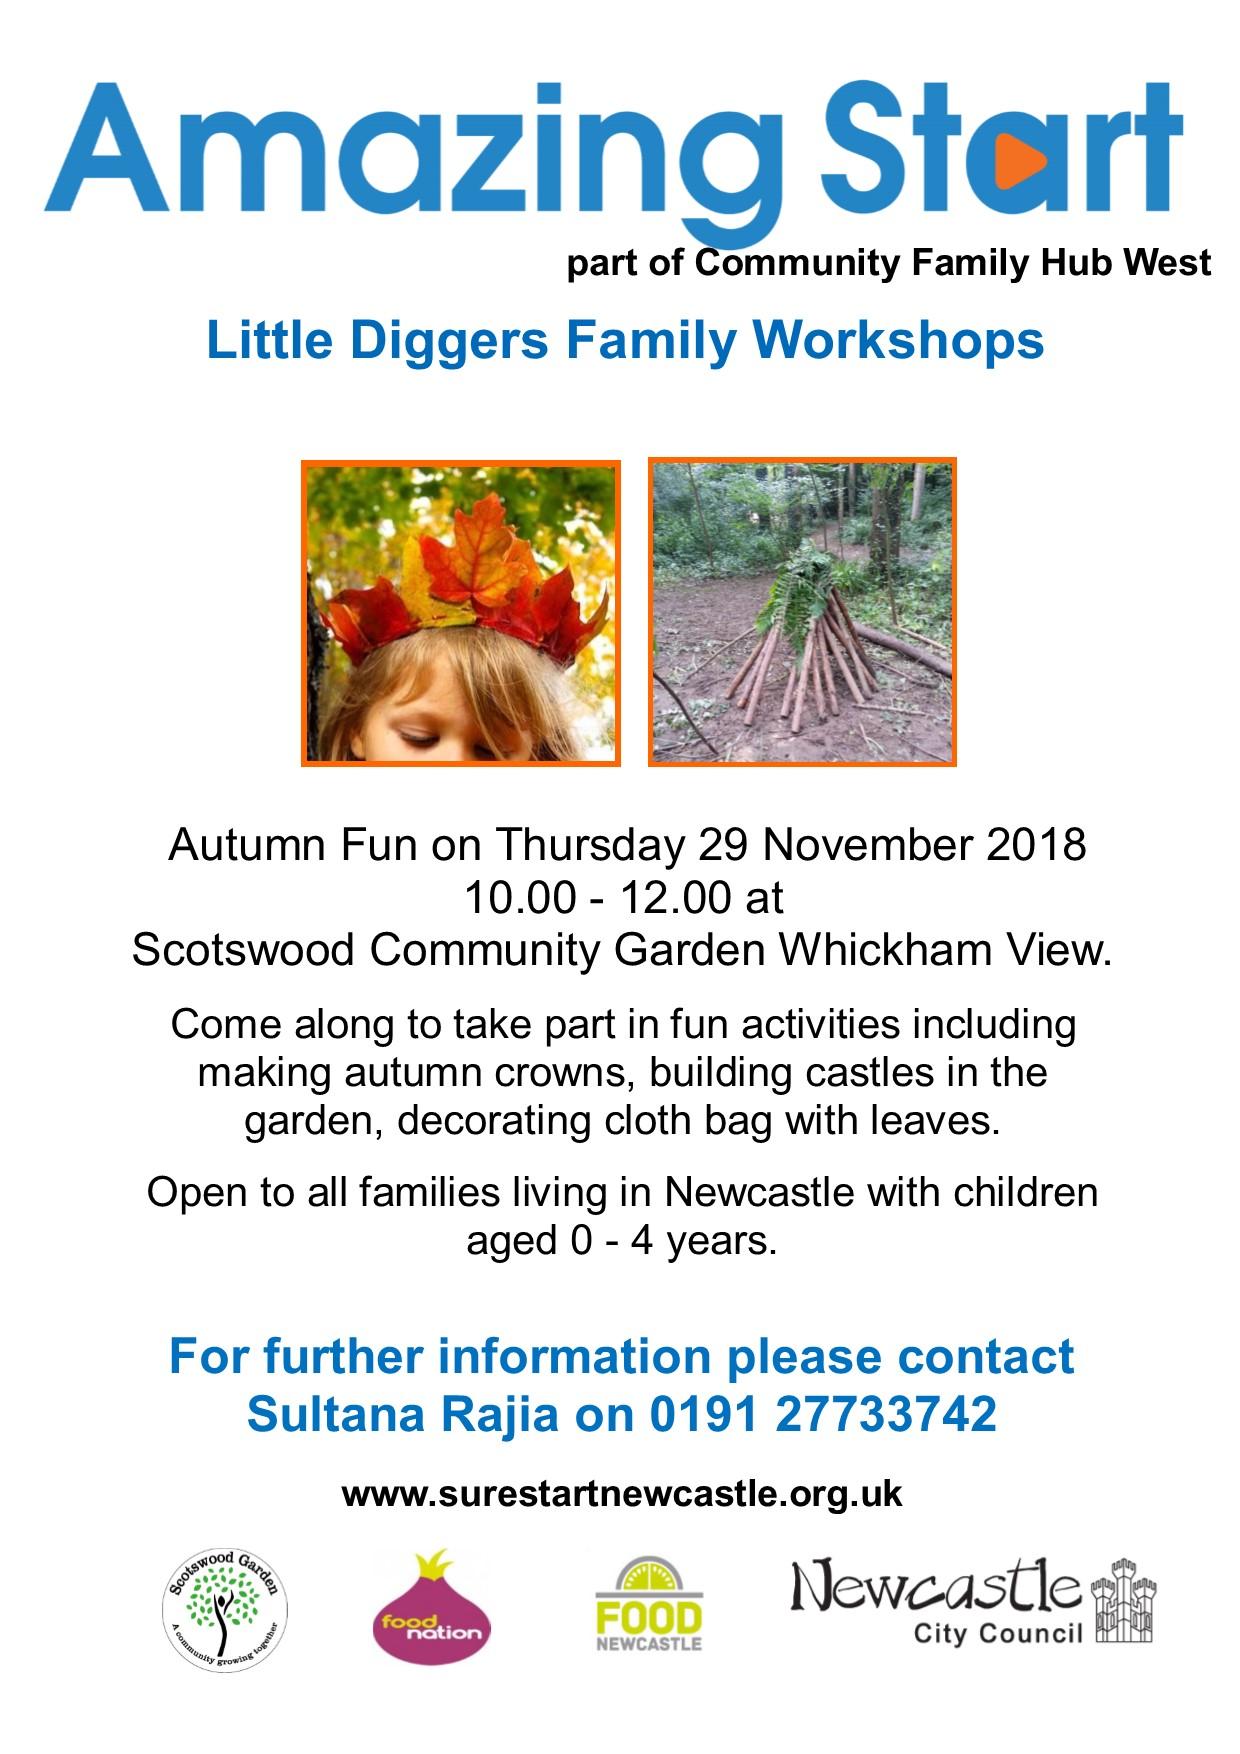 Little Diggers 29 November 2018 1